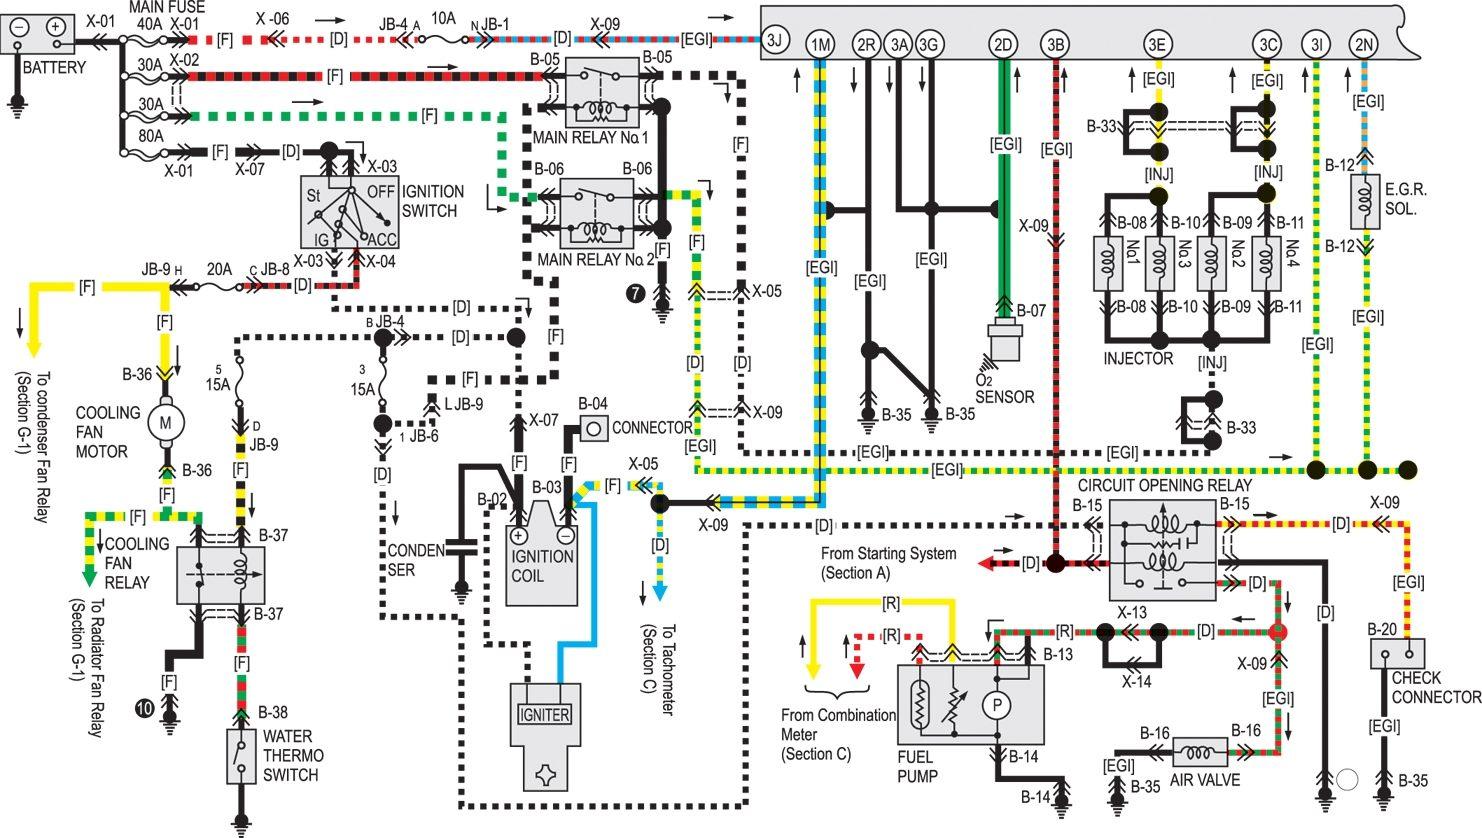 bt 50 wiring diagram simple block of computer mazda 15 23 tefolia de free 1995 626 manual 2019 ebook library mpv1994